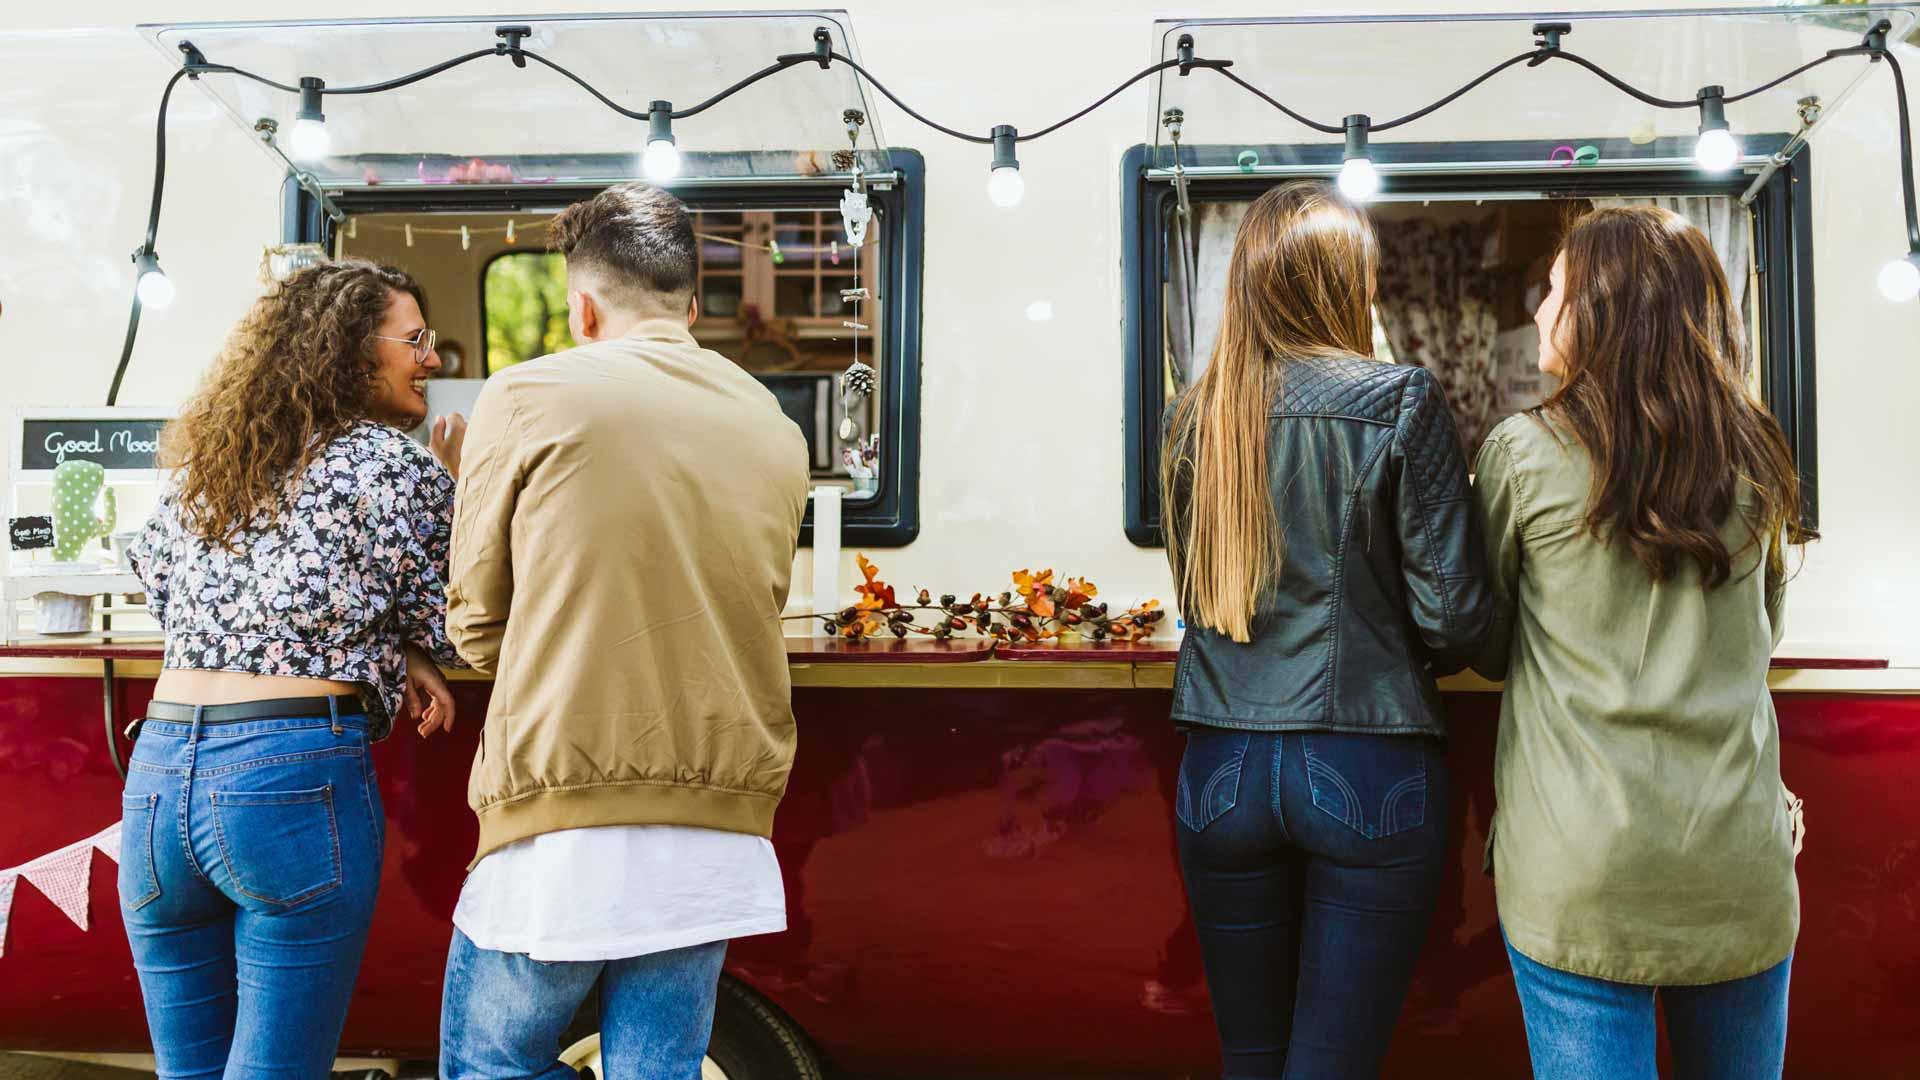 MacRae-Rentals-Counter-top-fridge-hire-easy-rental-for-Brisbane-events-and-shops-header-image-1920x1080